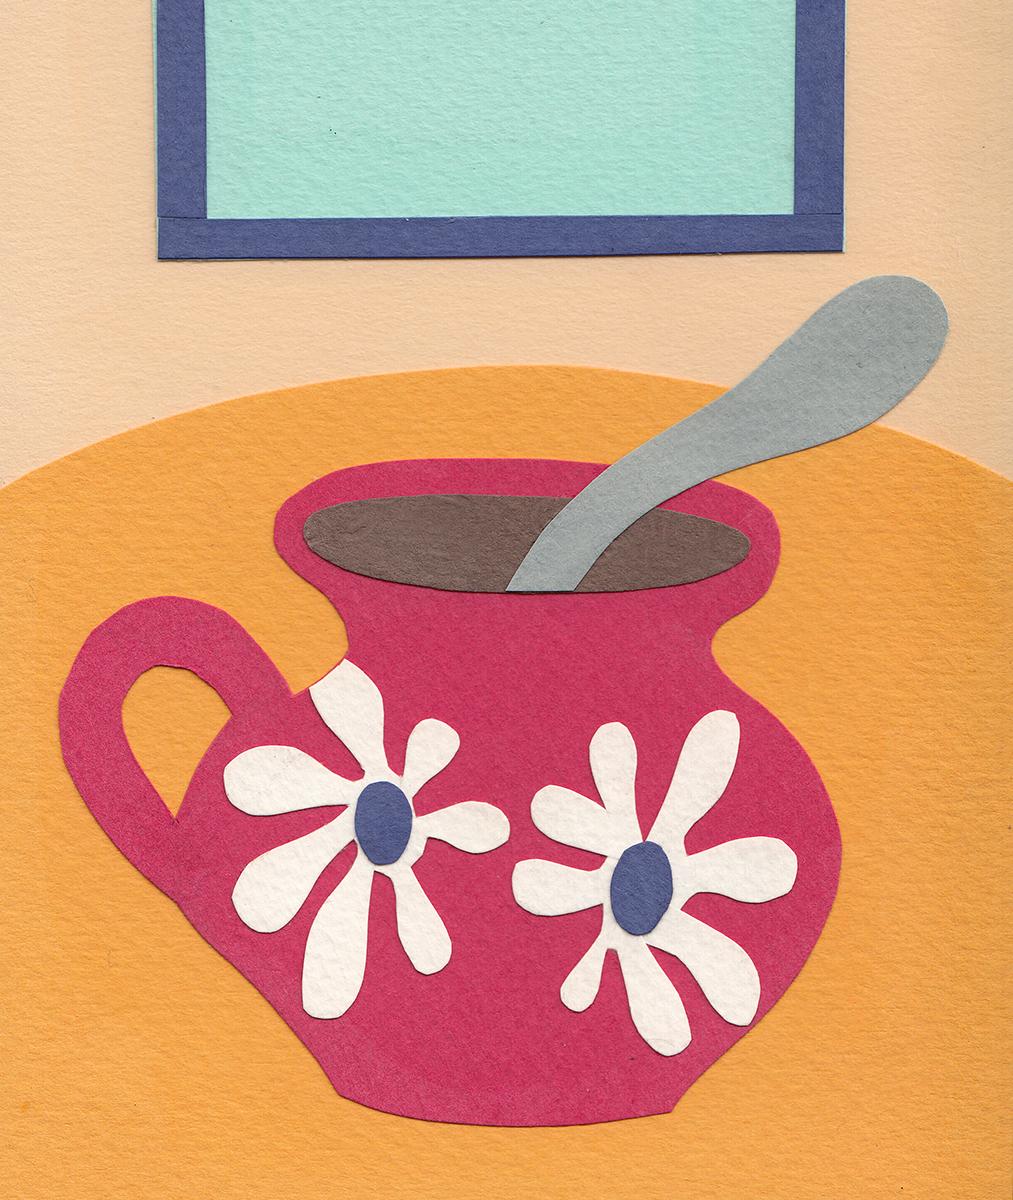 cafedeolla.jpg